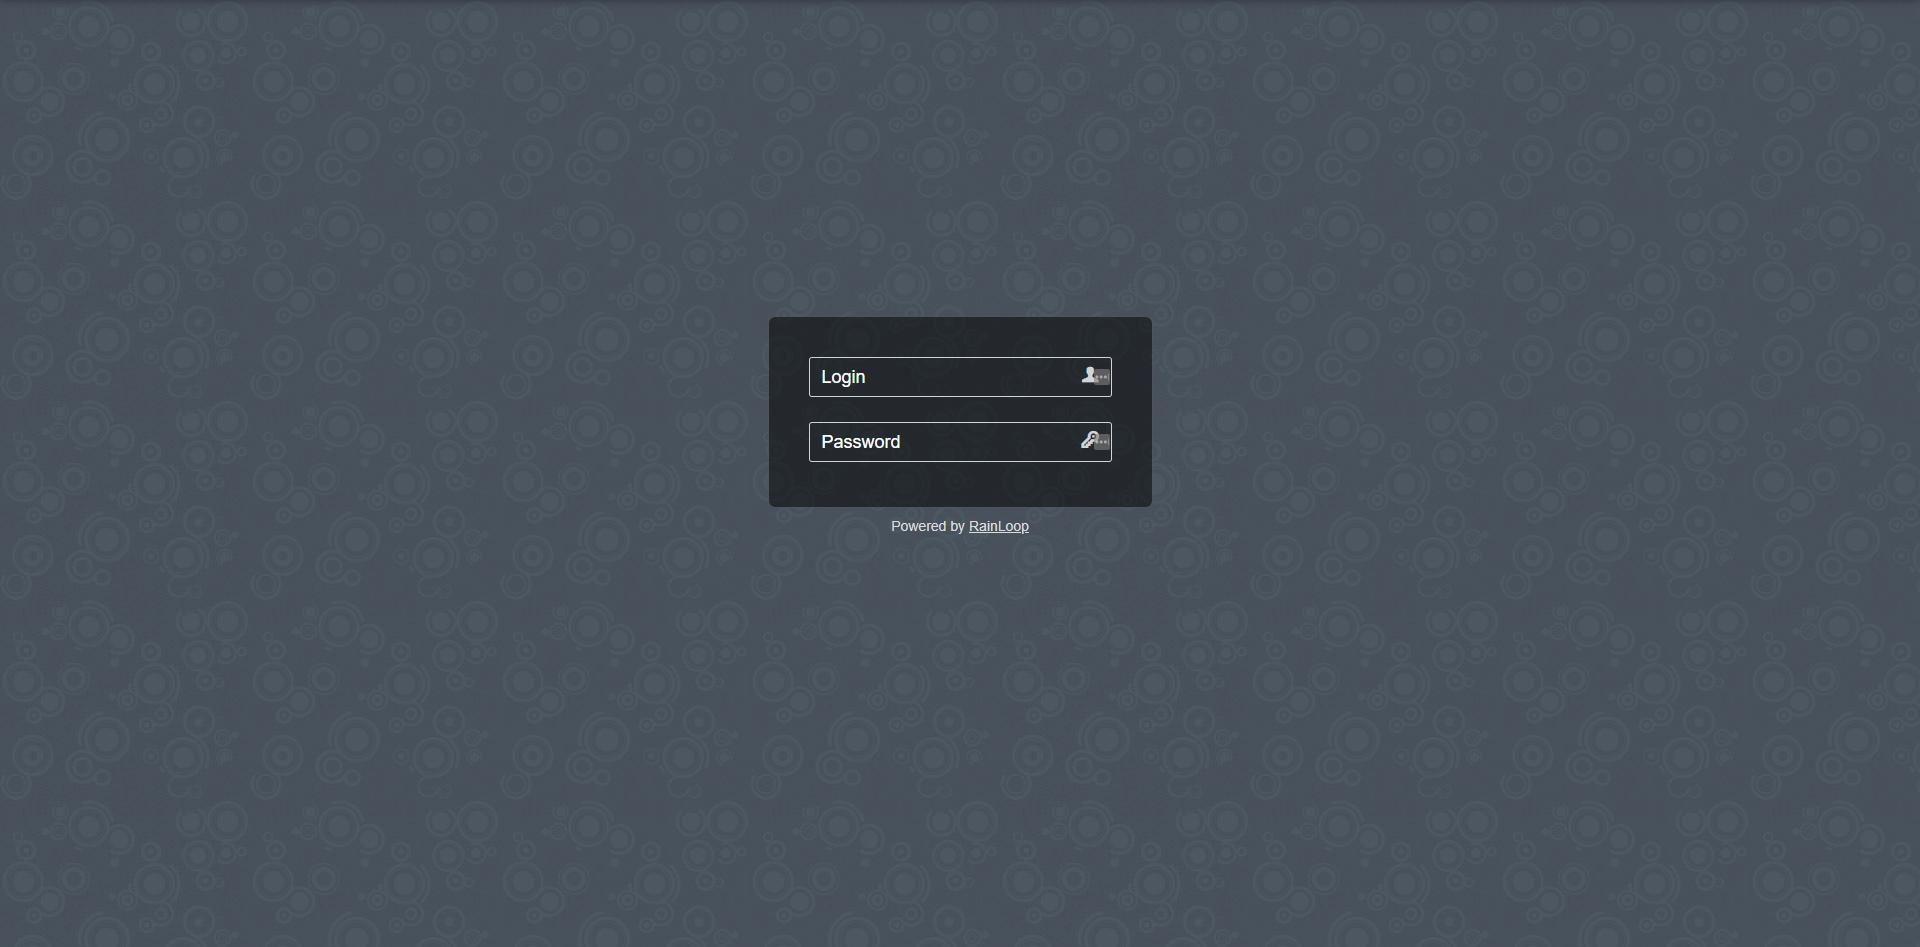 RainLoop Admin Login Page